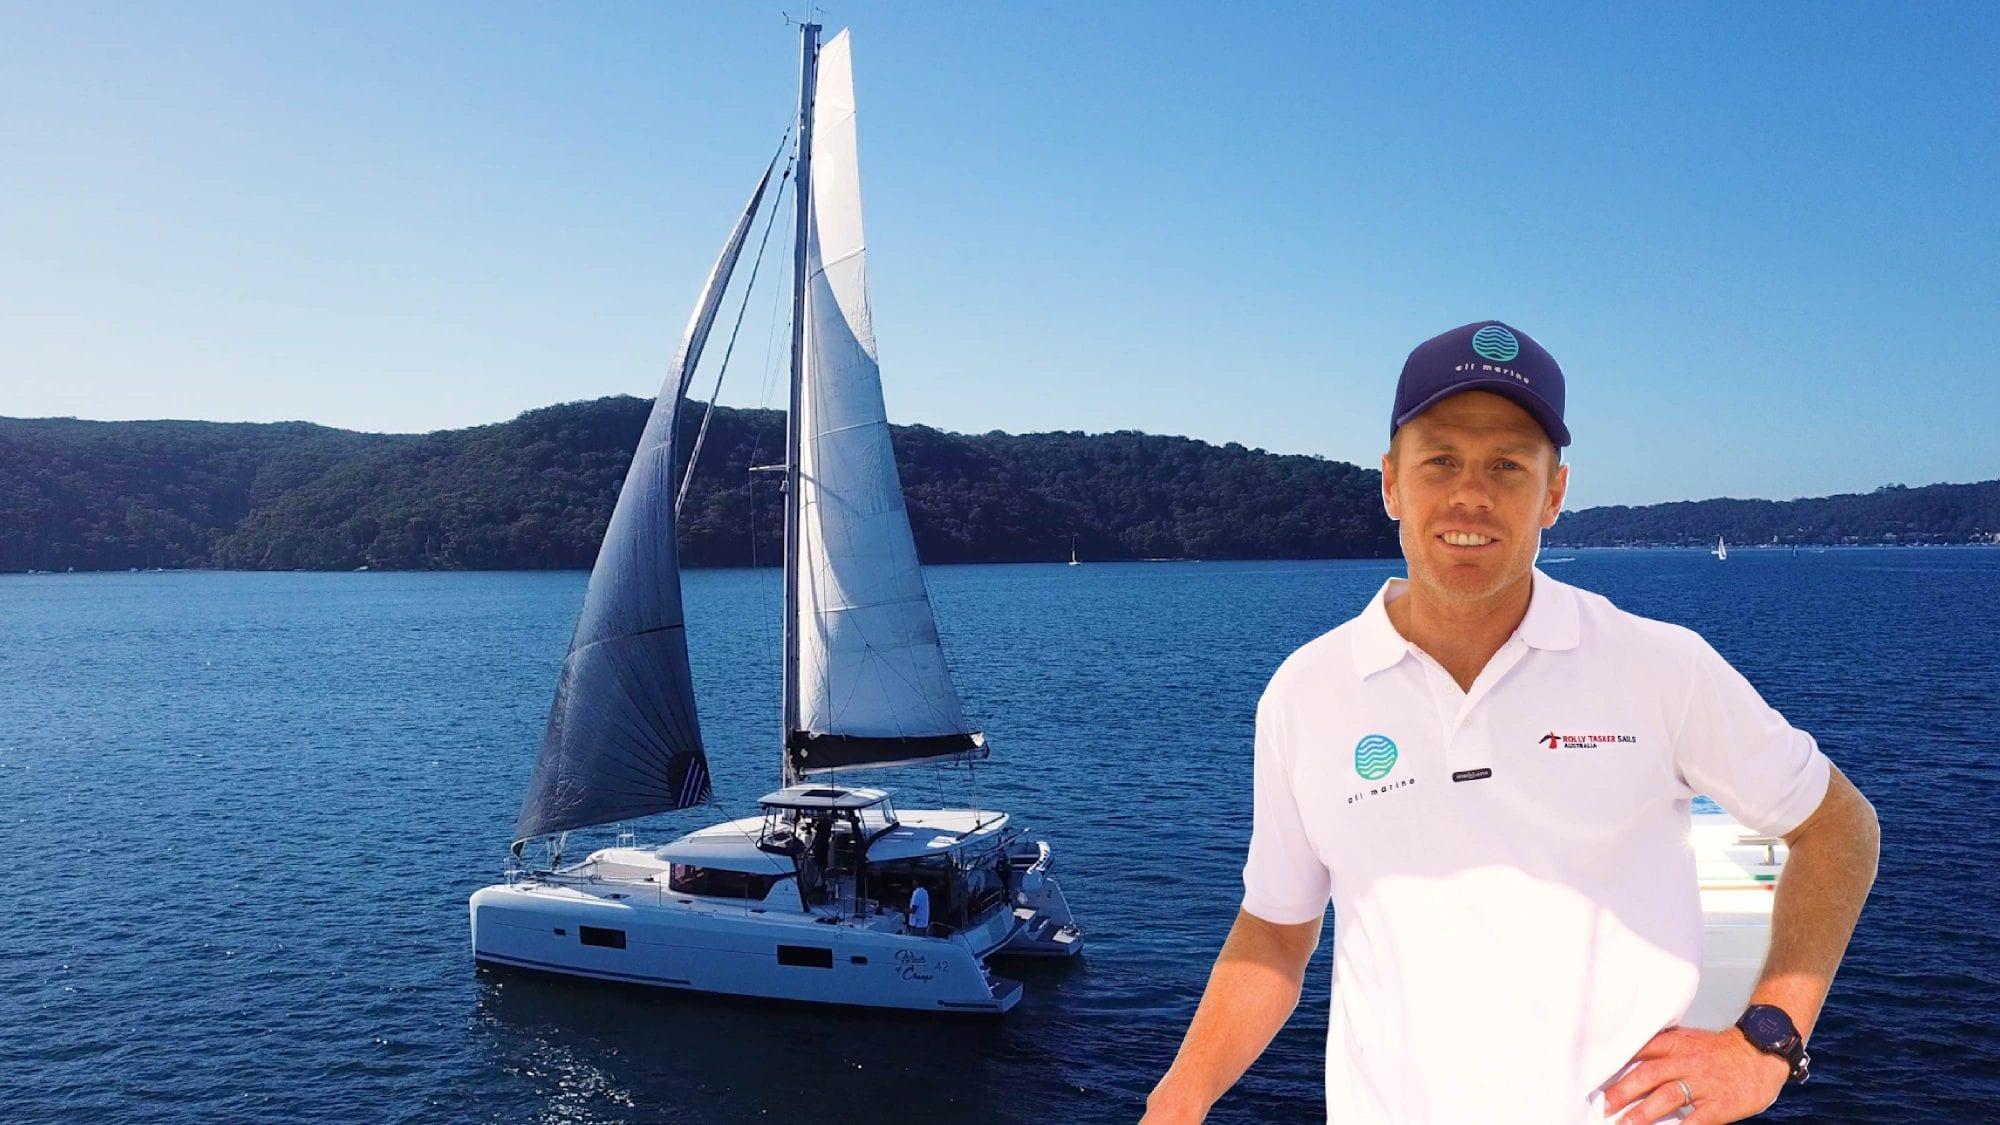 Catamaran Sail Trim with Sam Newton